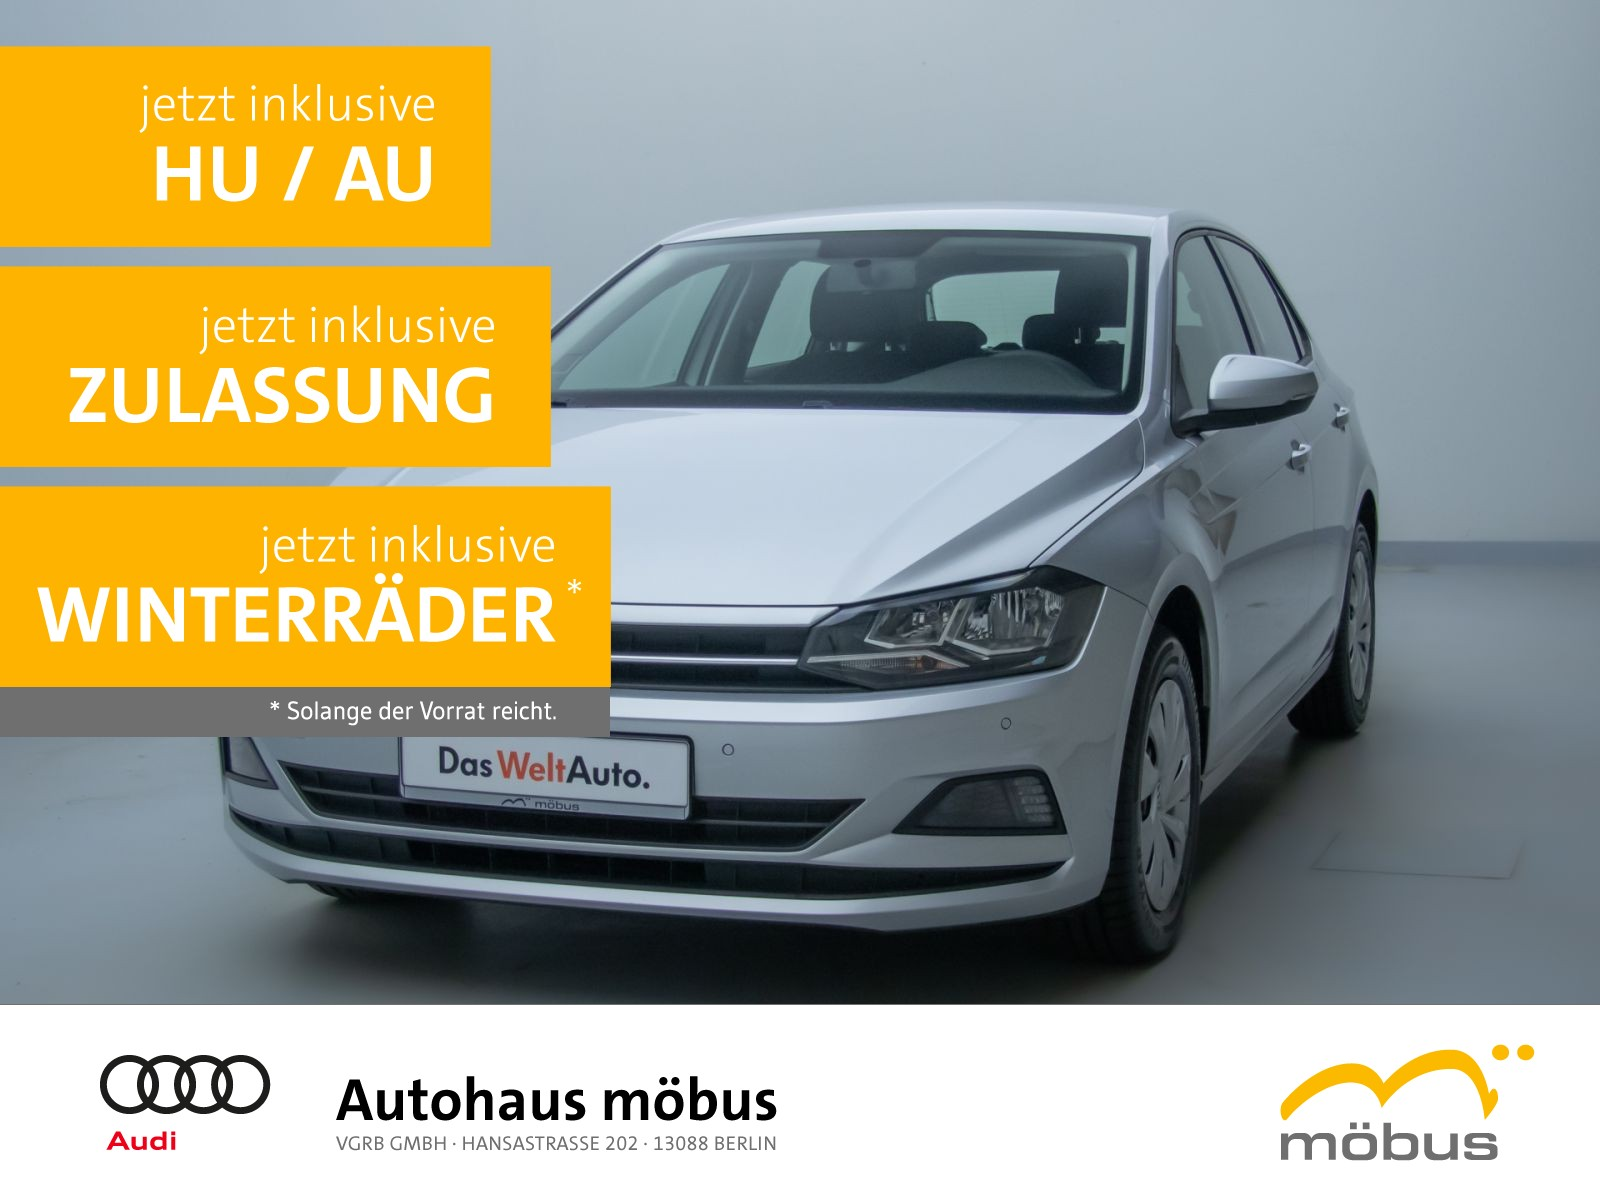 Volkswagen Polo 1.0 TSI*COMFORTL*PDC*NAVI*KLIMA*USB*TELEFON, Jahr 2019, Benzin